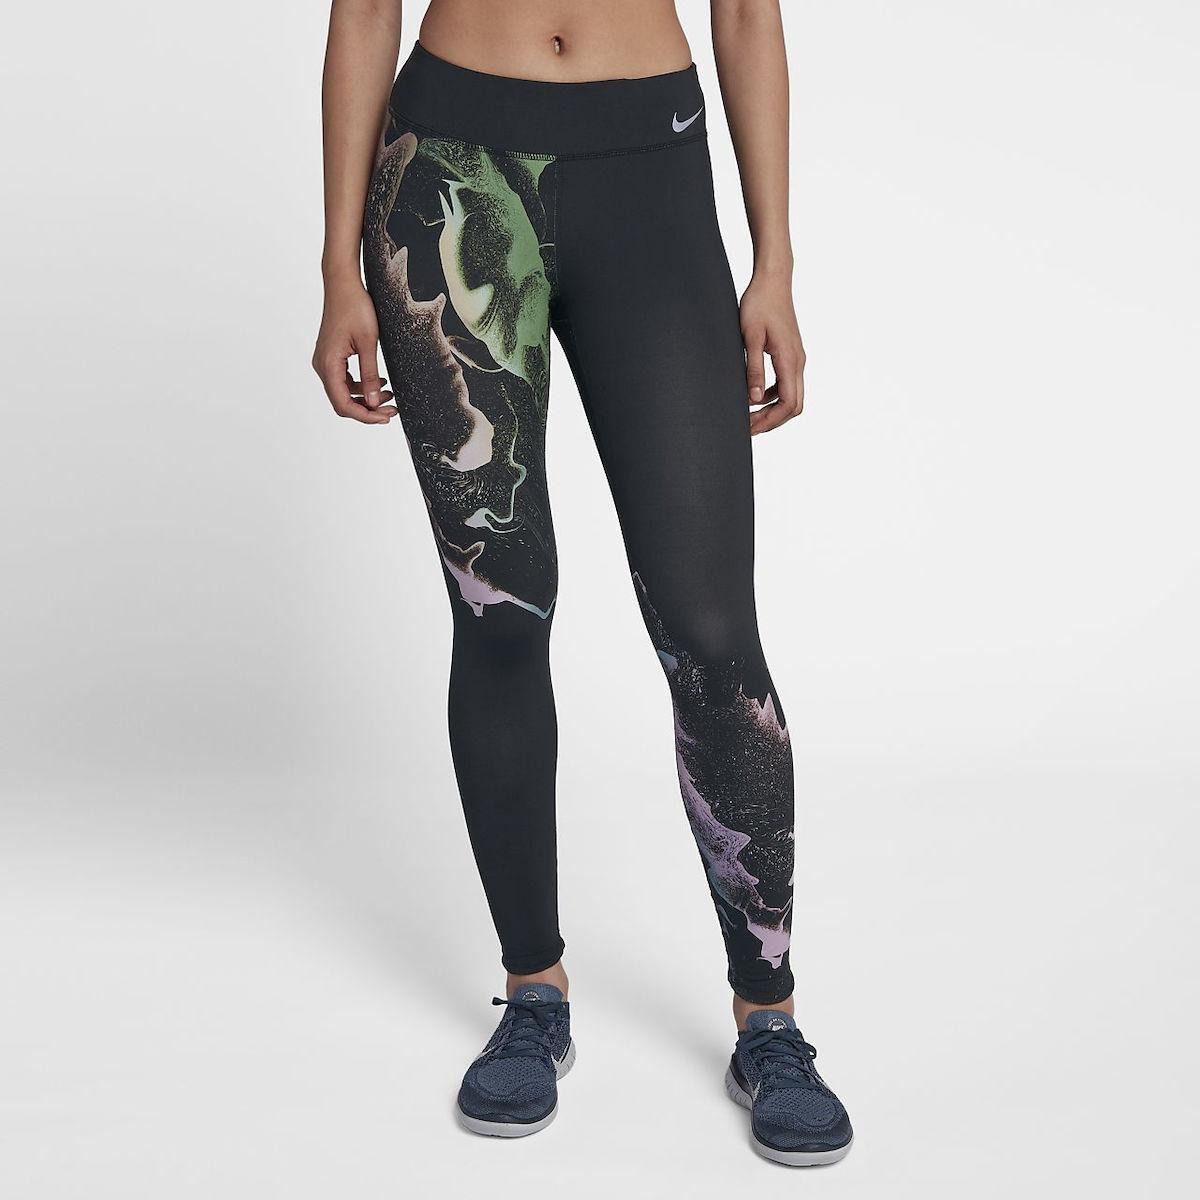 Womens NIKE POWER Epic Lux Running Tights XS  AQ0401-010